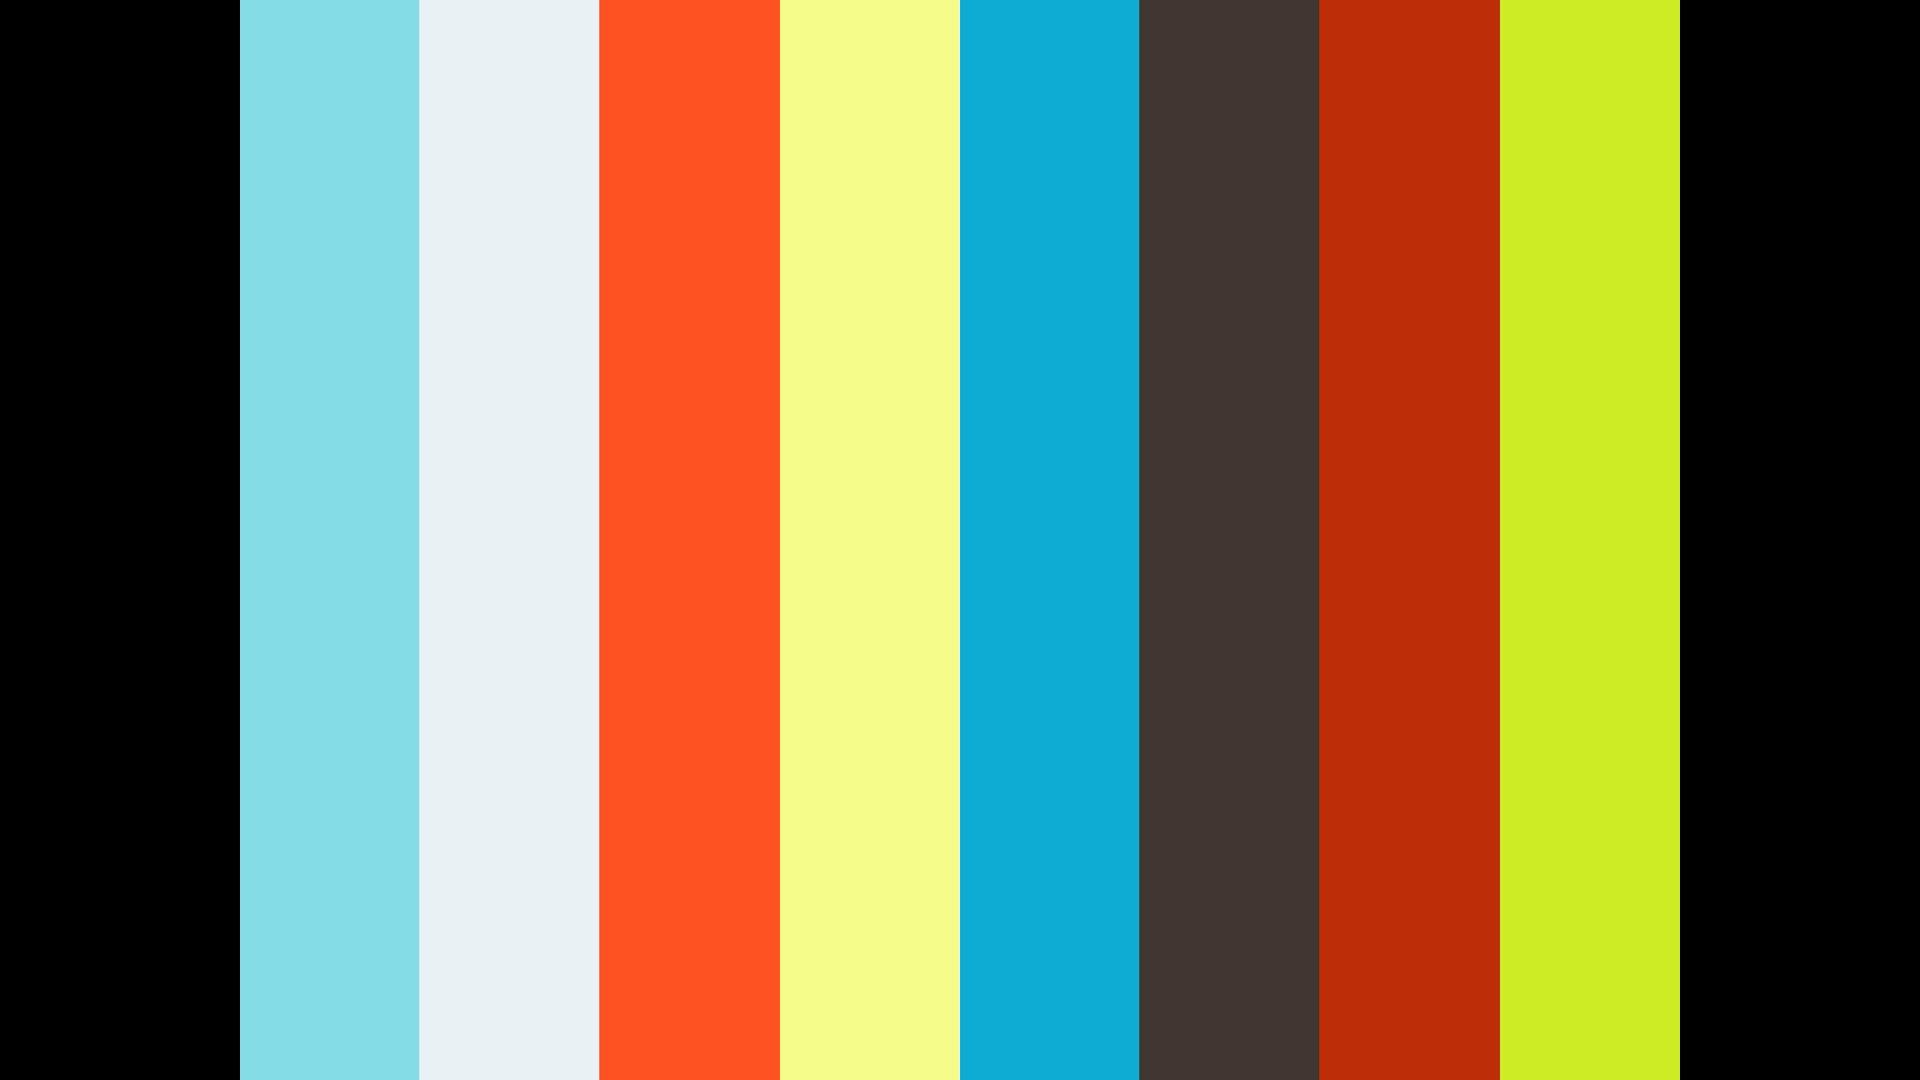 2021-01-18 LIFOU PMT - BAGUS LA MANTA OCEANIQUE